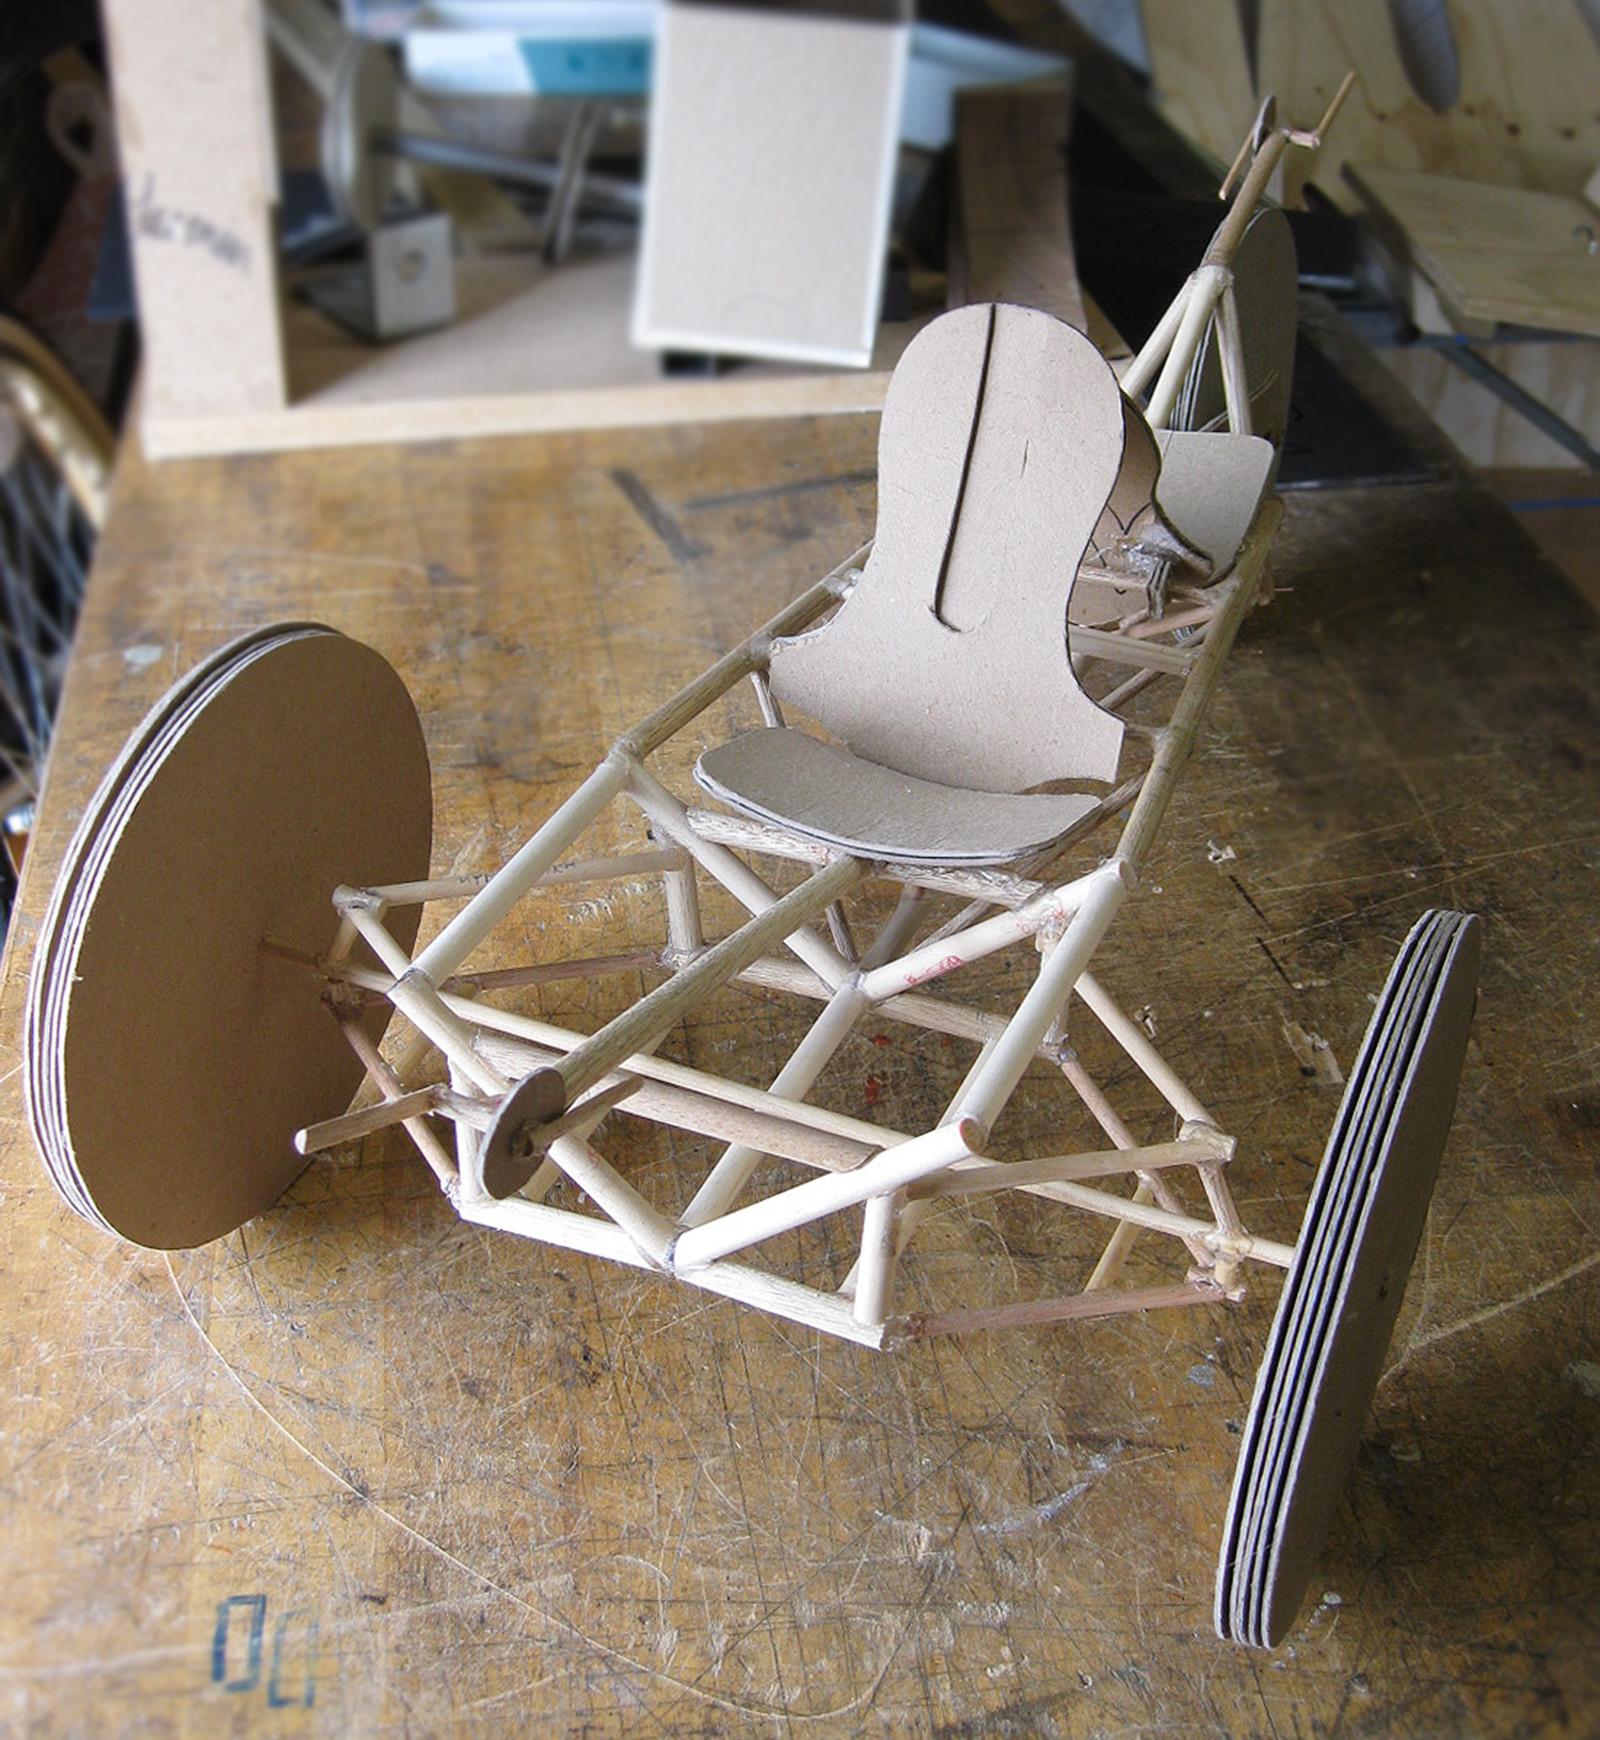 1/4-scale Model